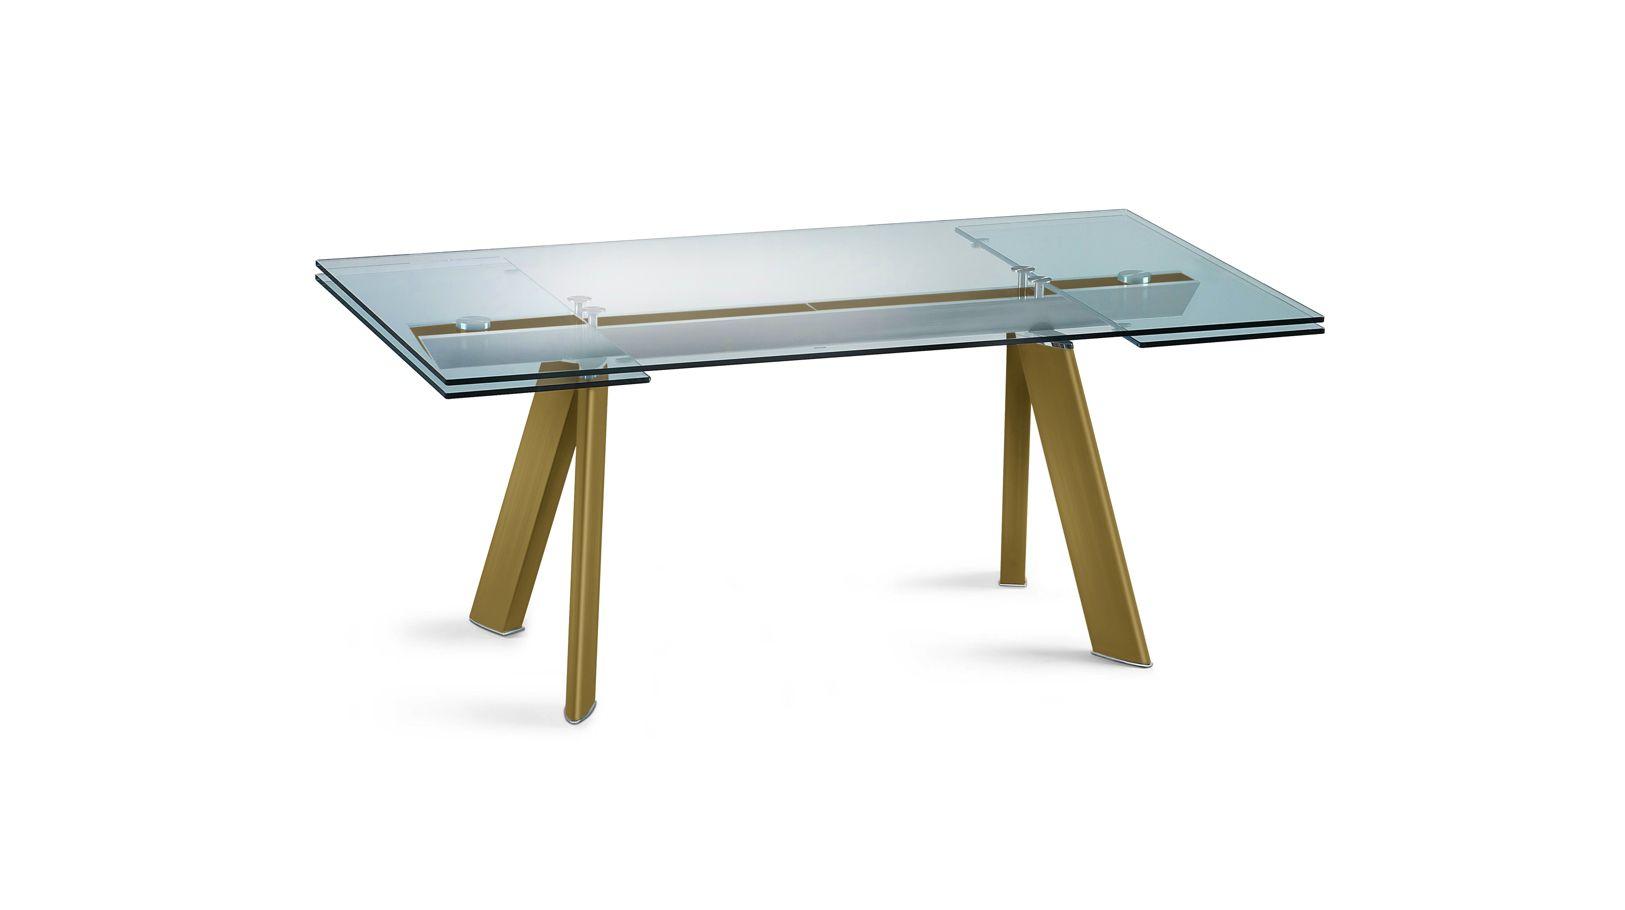 Table de repas chronos anodise roche bobois - Table roche et bobois ...